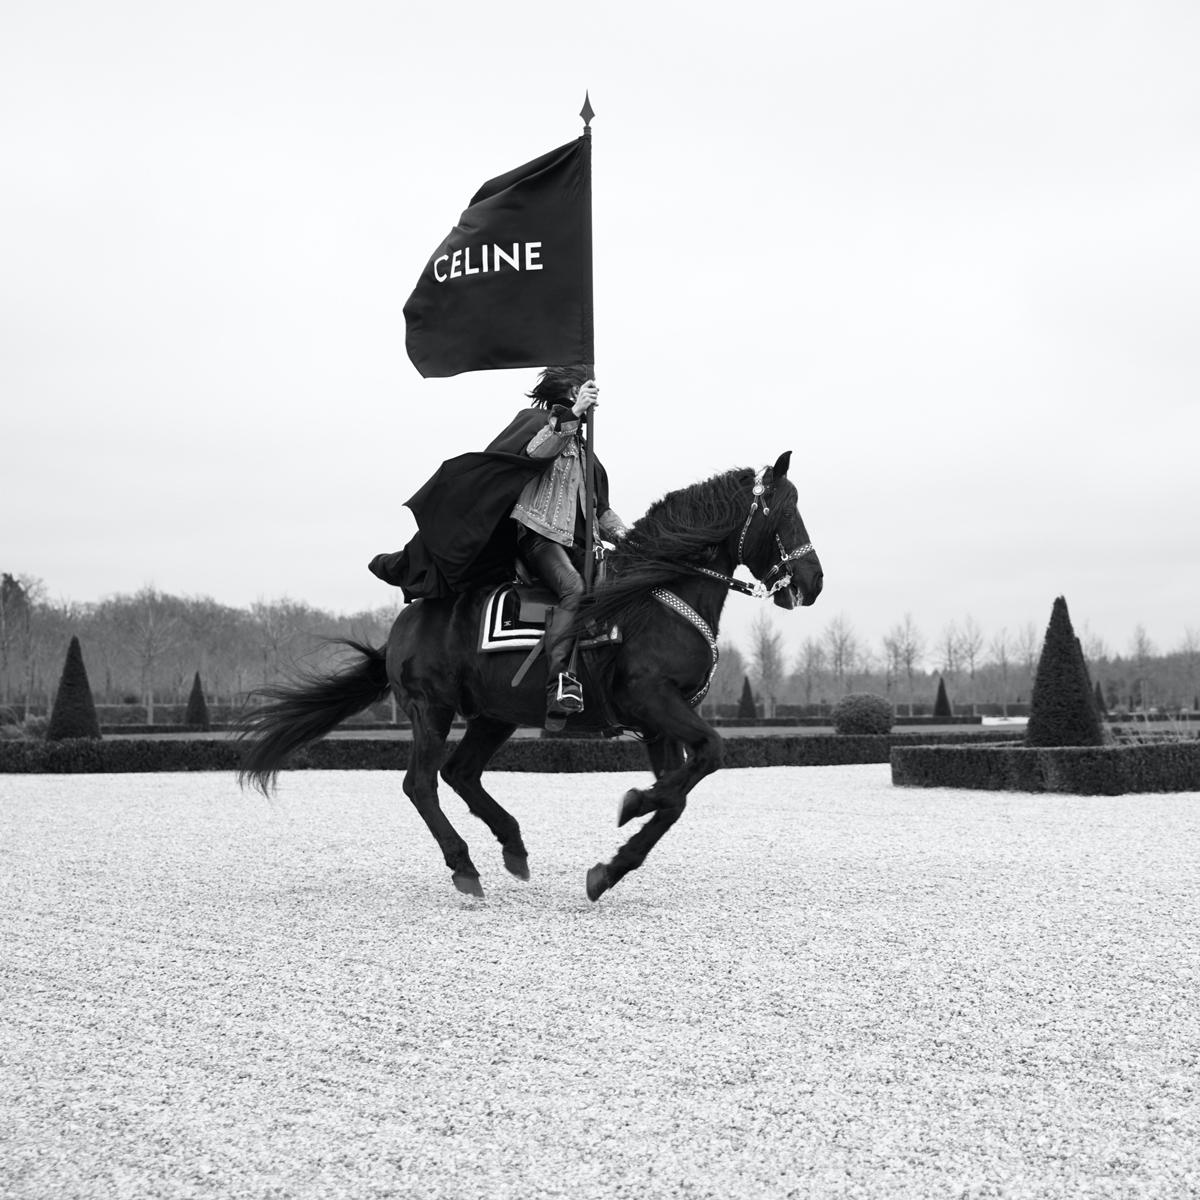 Celine Homme Autumn/Winter 2021 Collection Preview & Short Film